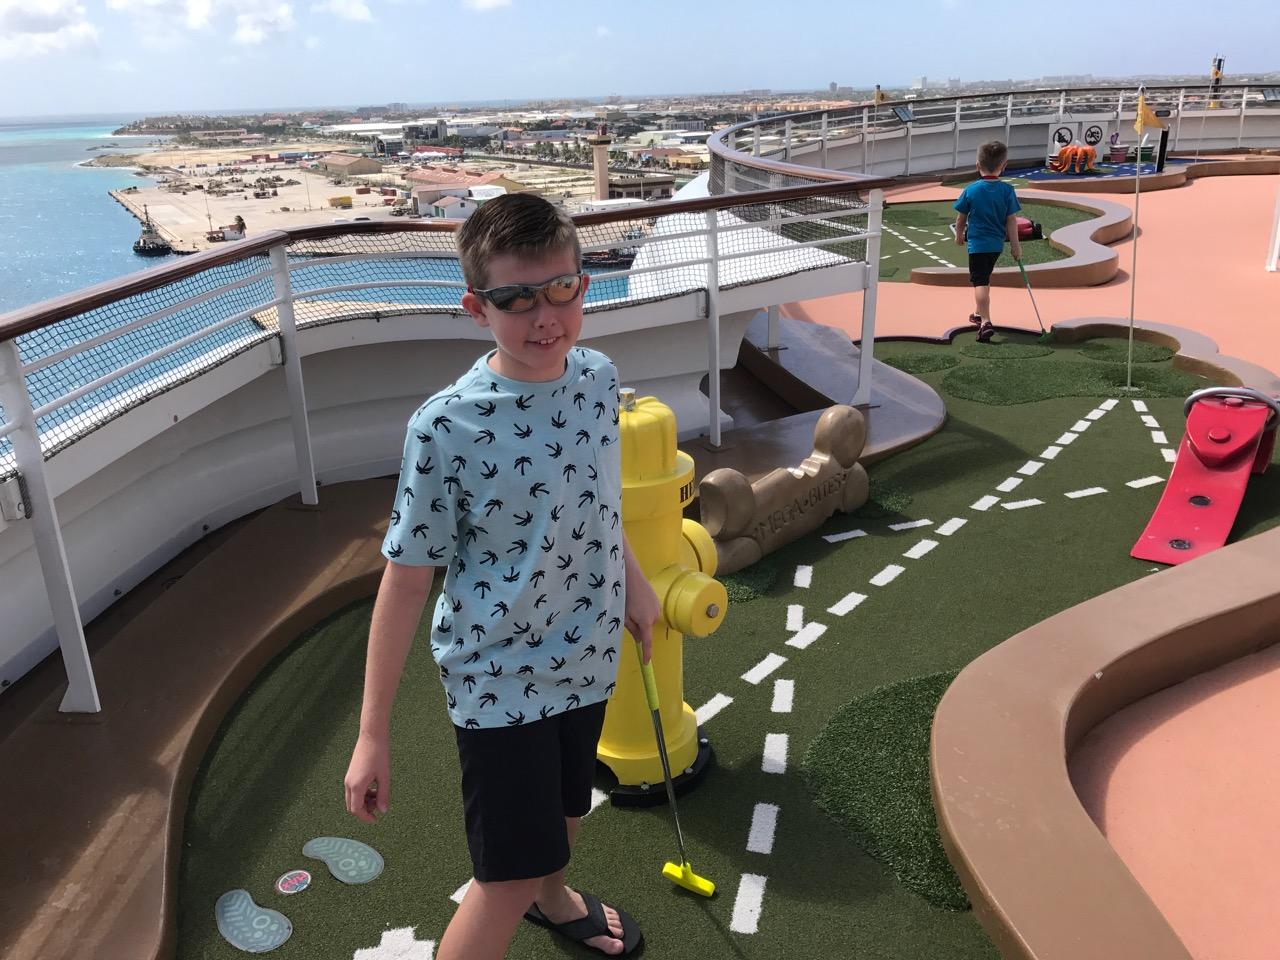 DIsney Fantasy - Goofy Golf